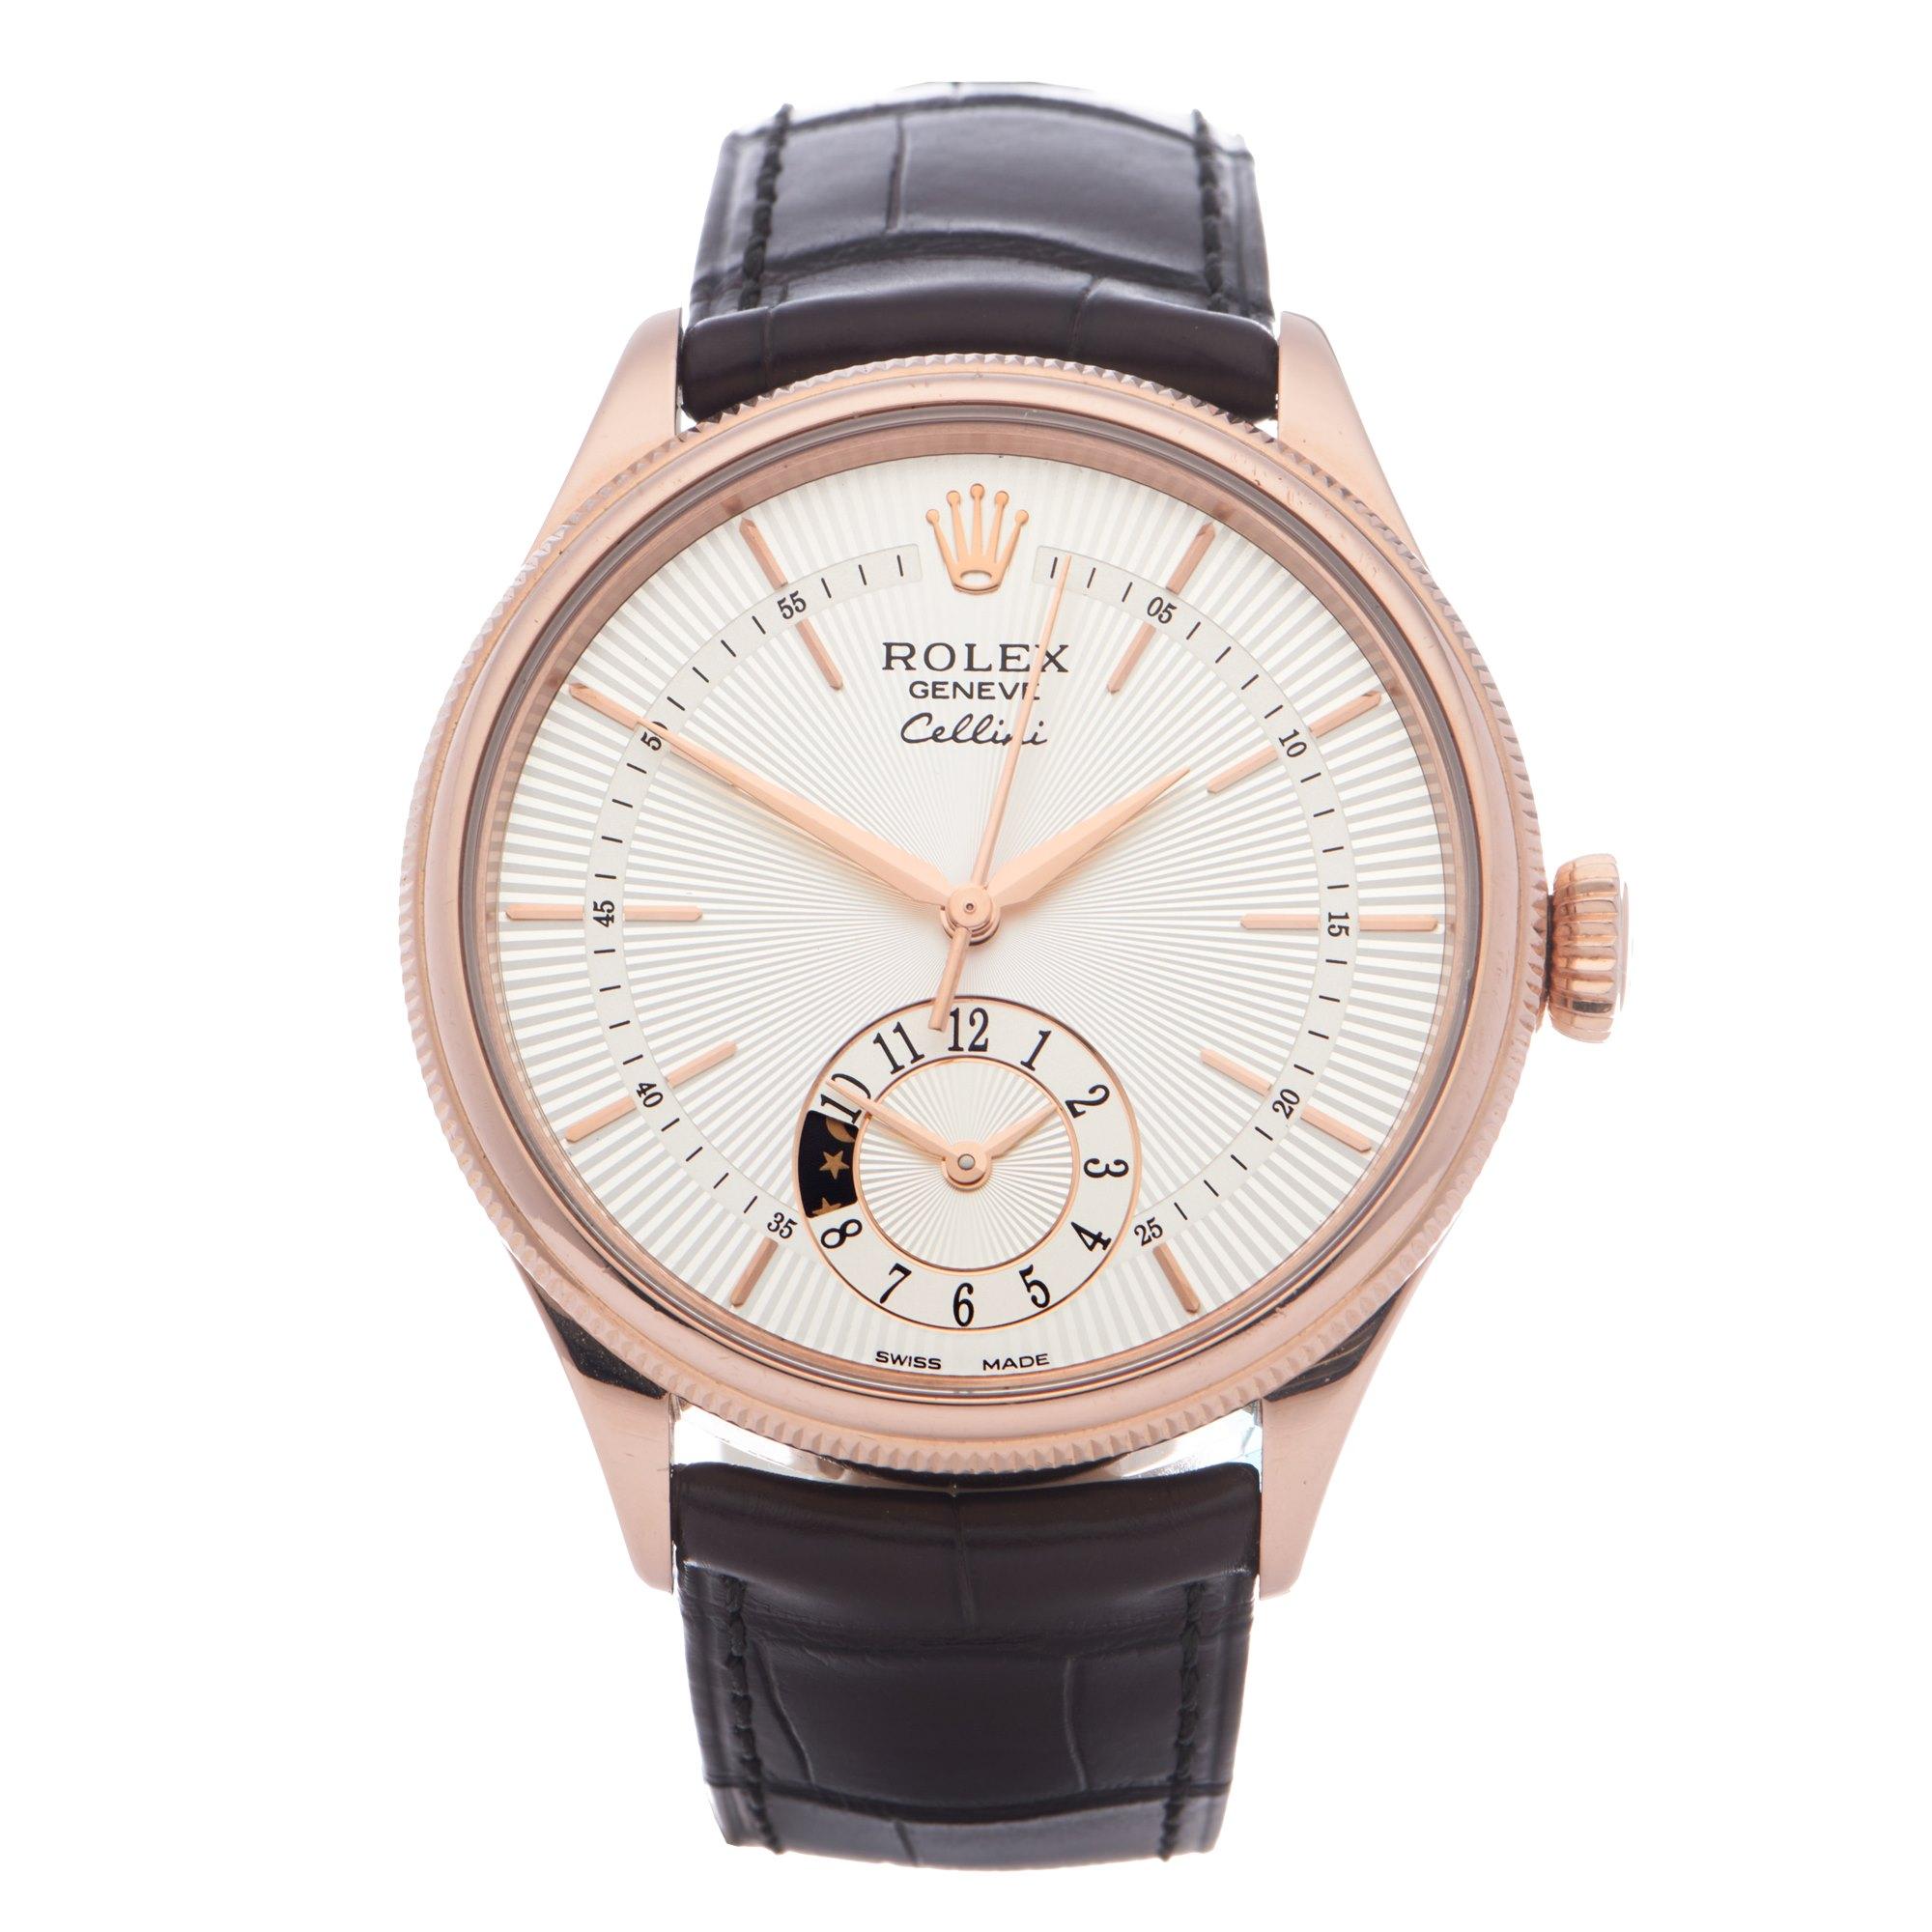 Rolex Cellini 18K Rose Gold 50525